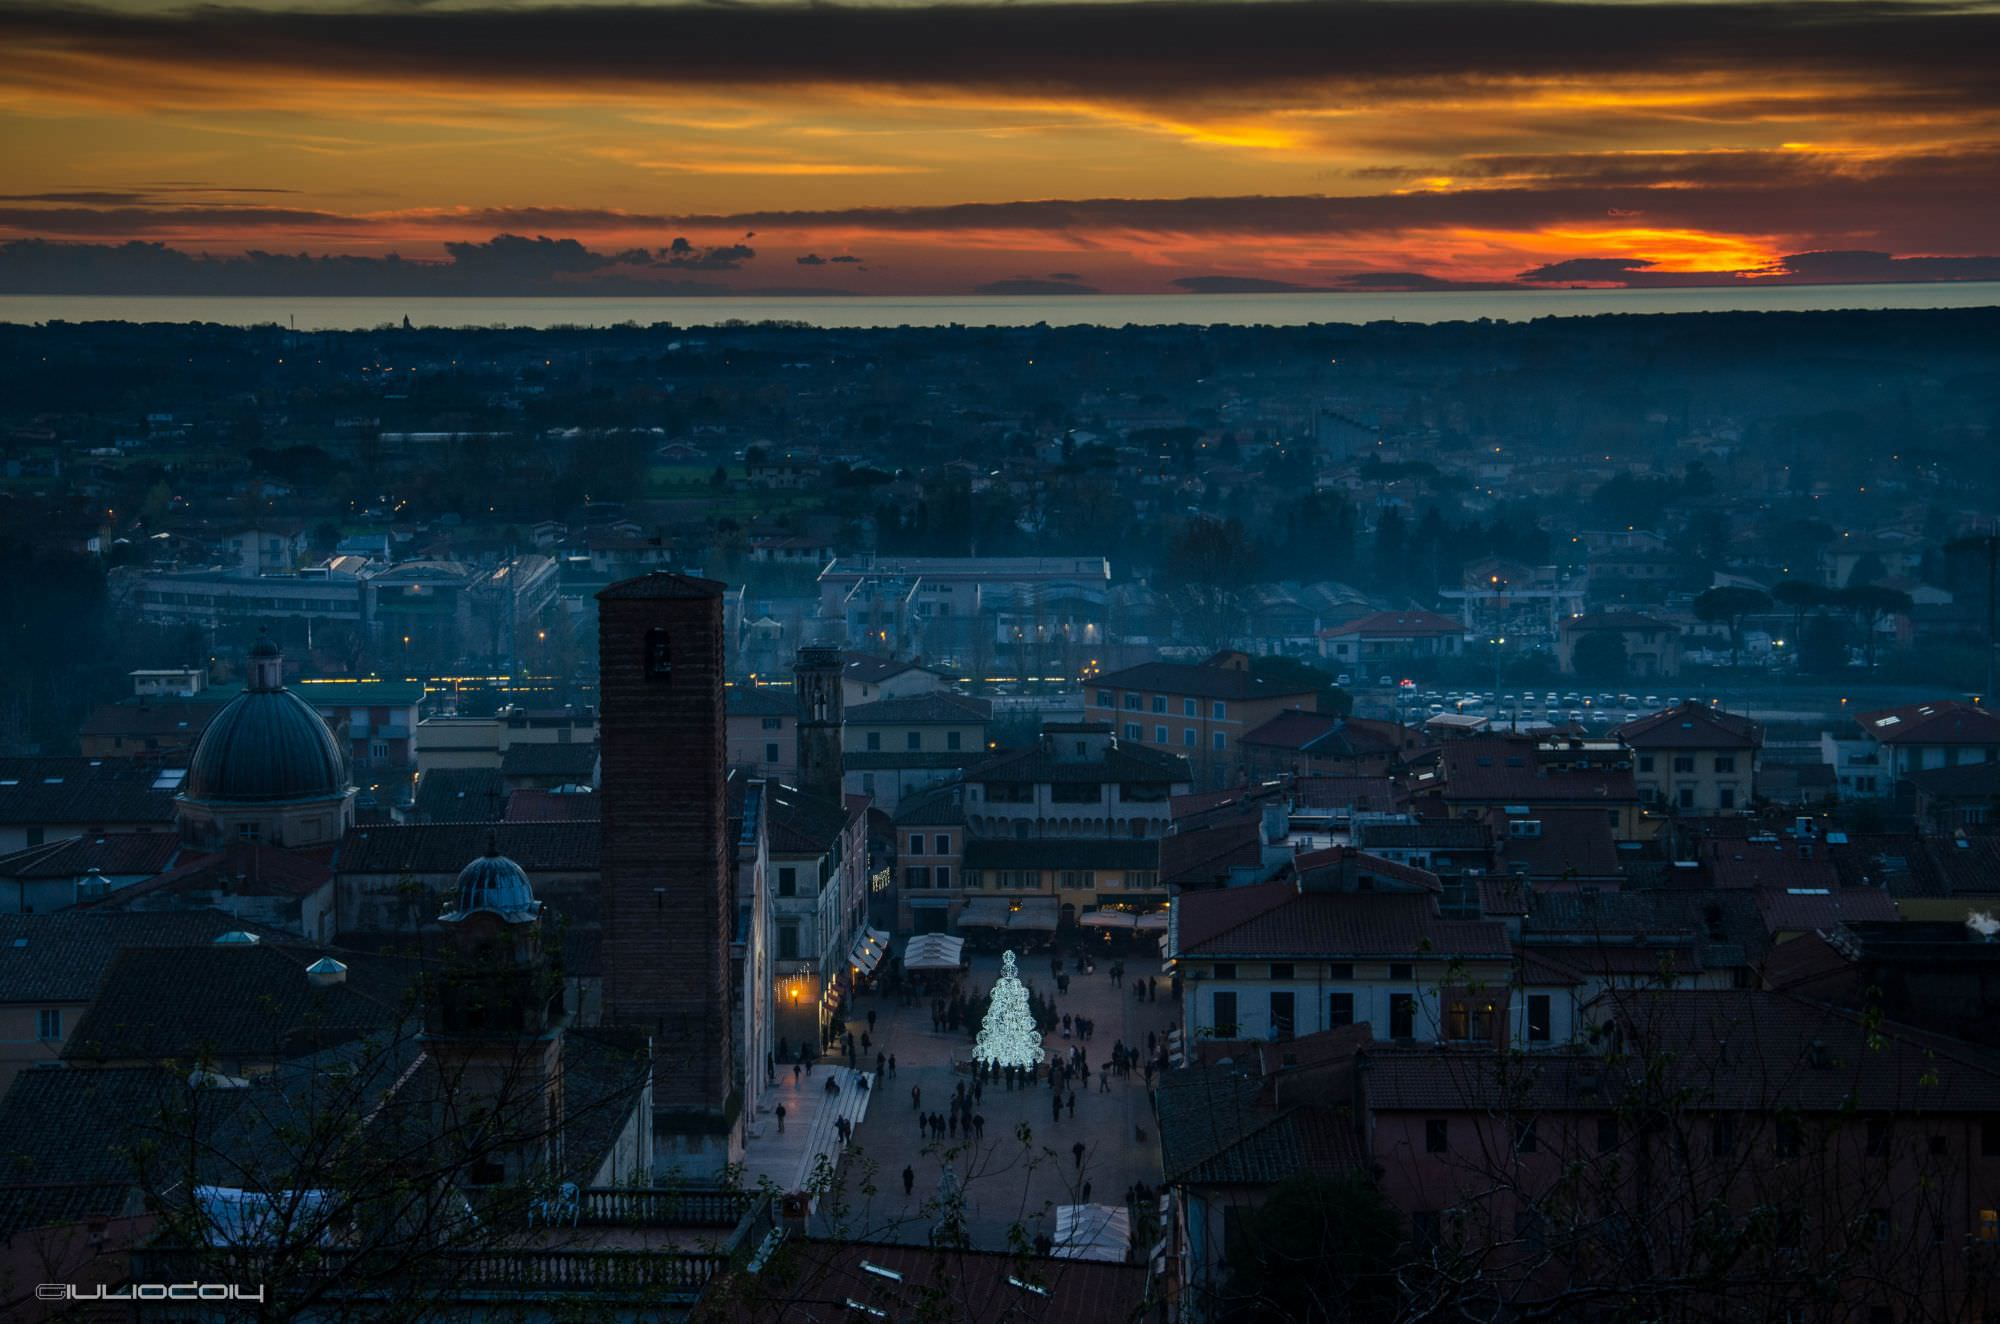 Cinque donne legate e imbavagliate: tentata rapina a Pietrasanta